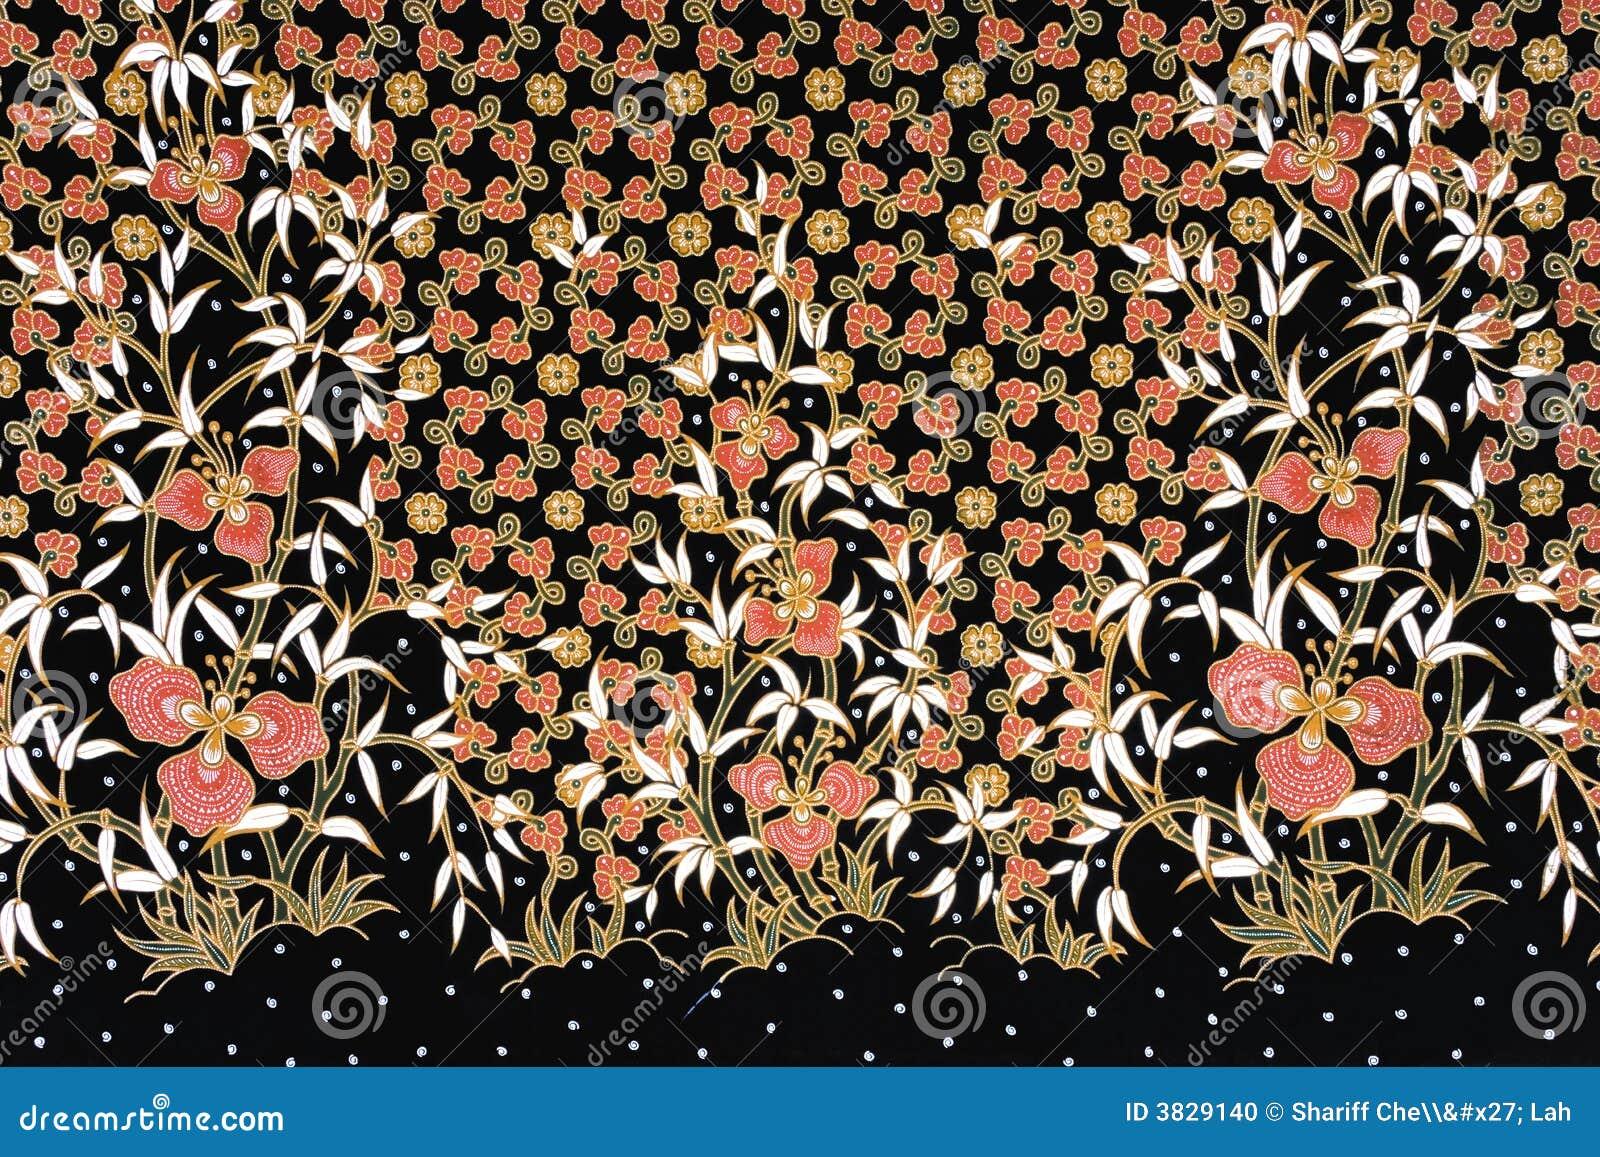 indonesian-batik-sarong-3829140.jpg